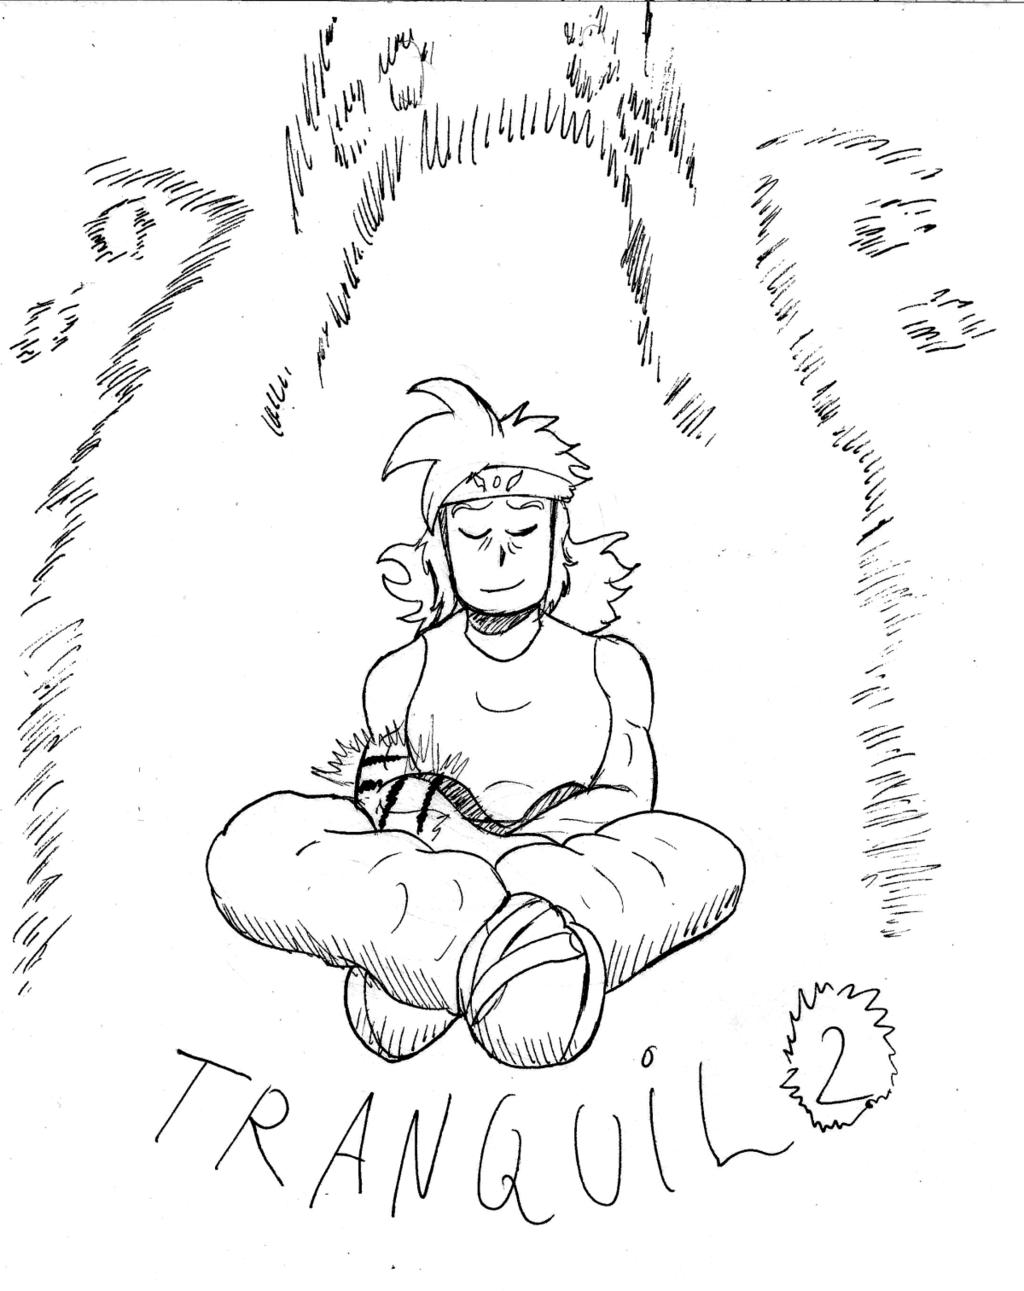 Inktober day 2: Tranquil